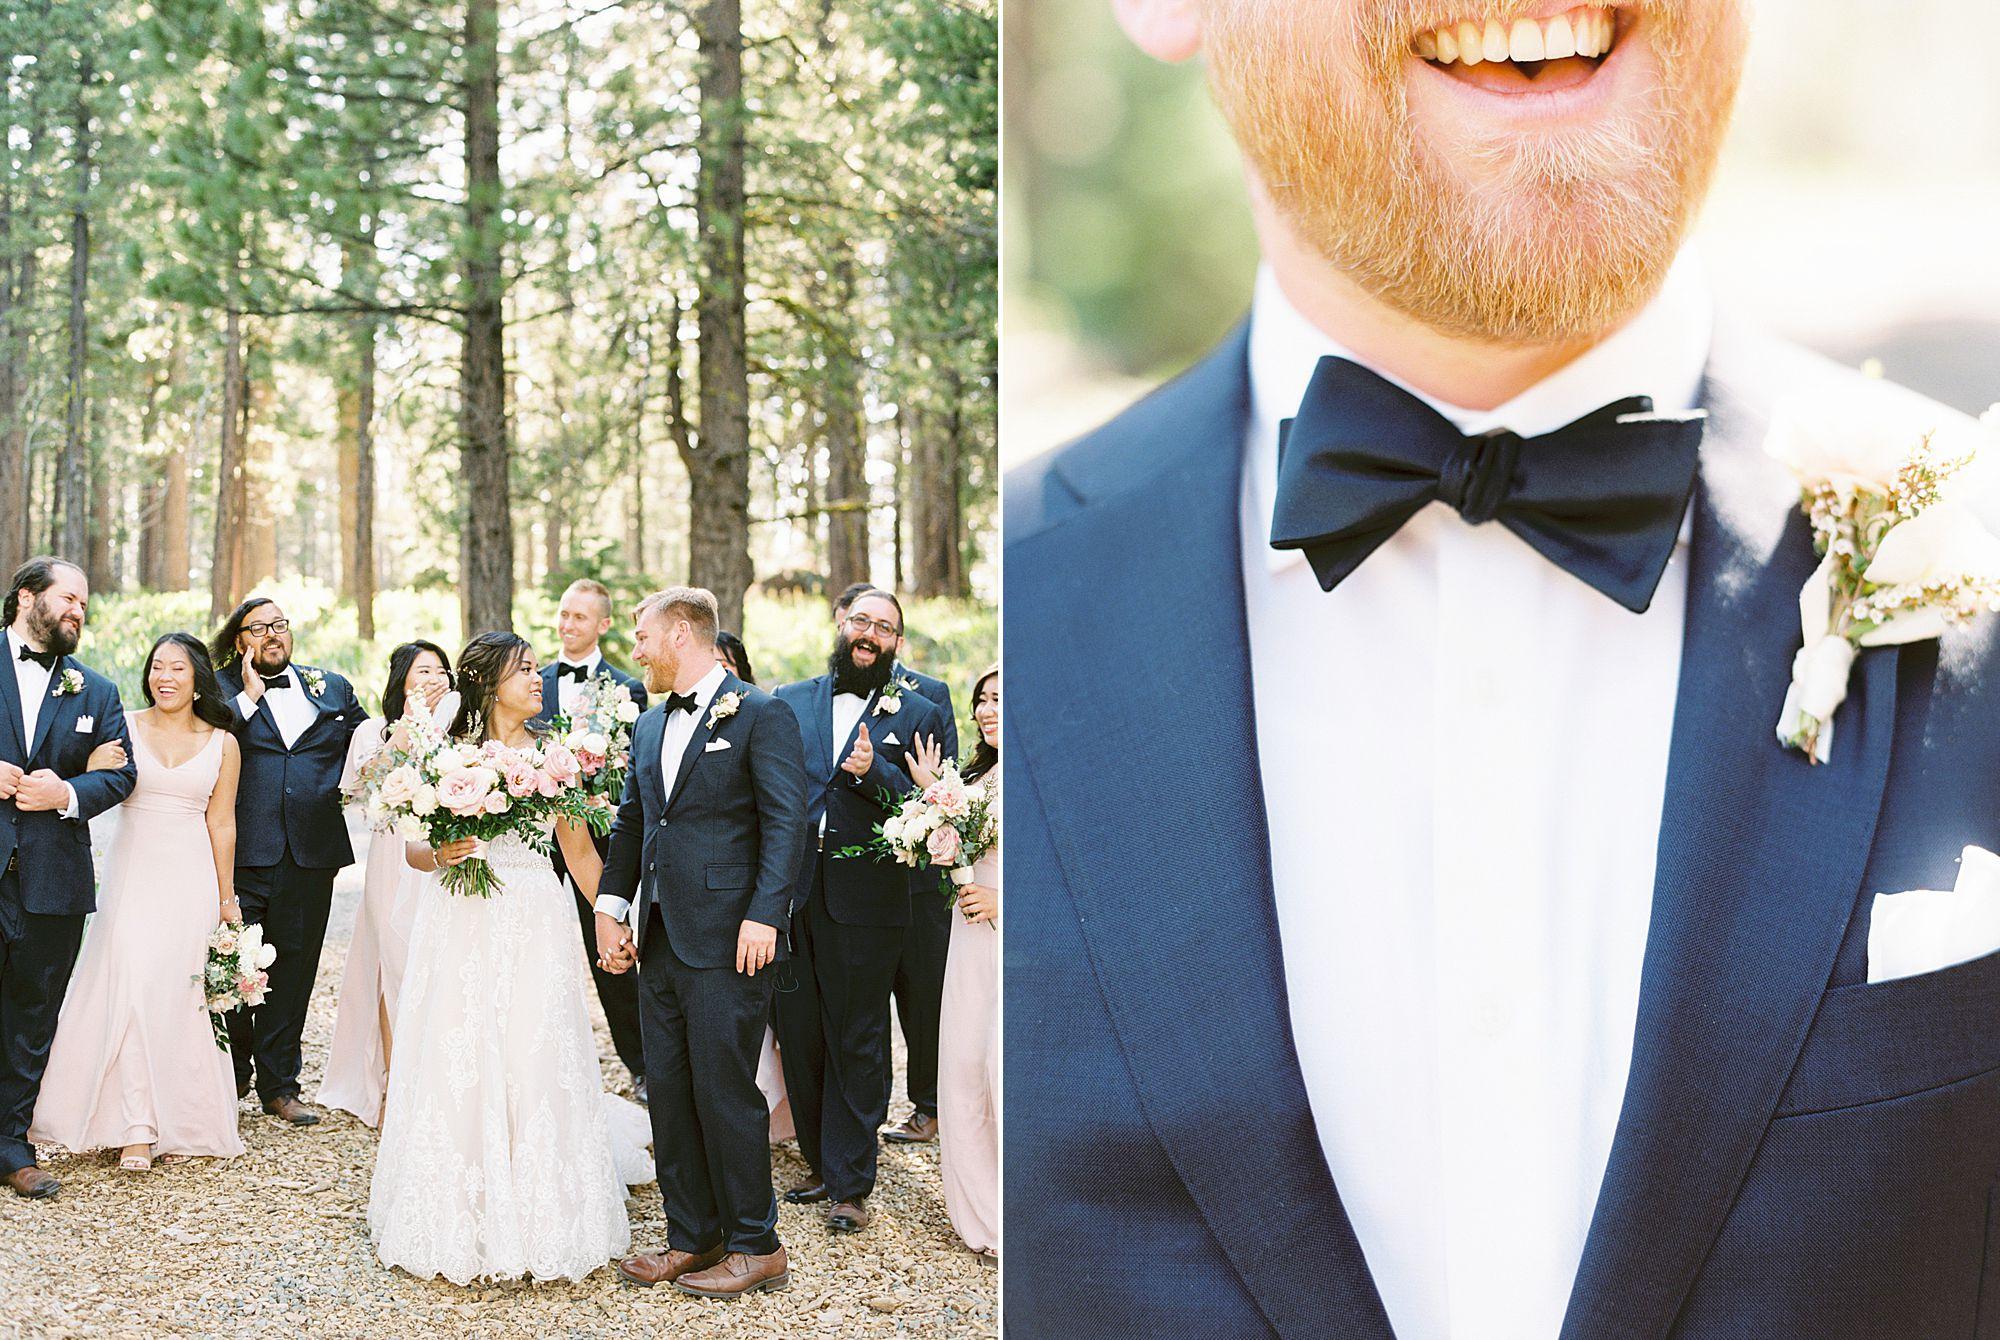 MITCHELLS MOUNTAIN MEADOWS Wedding - Ash Baumgartner - Phallina and Matt - Sierraville Wedding - Tahoe Wedding Photography_0012.jpg